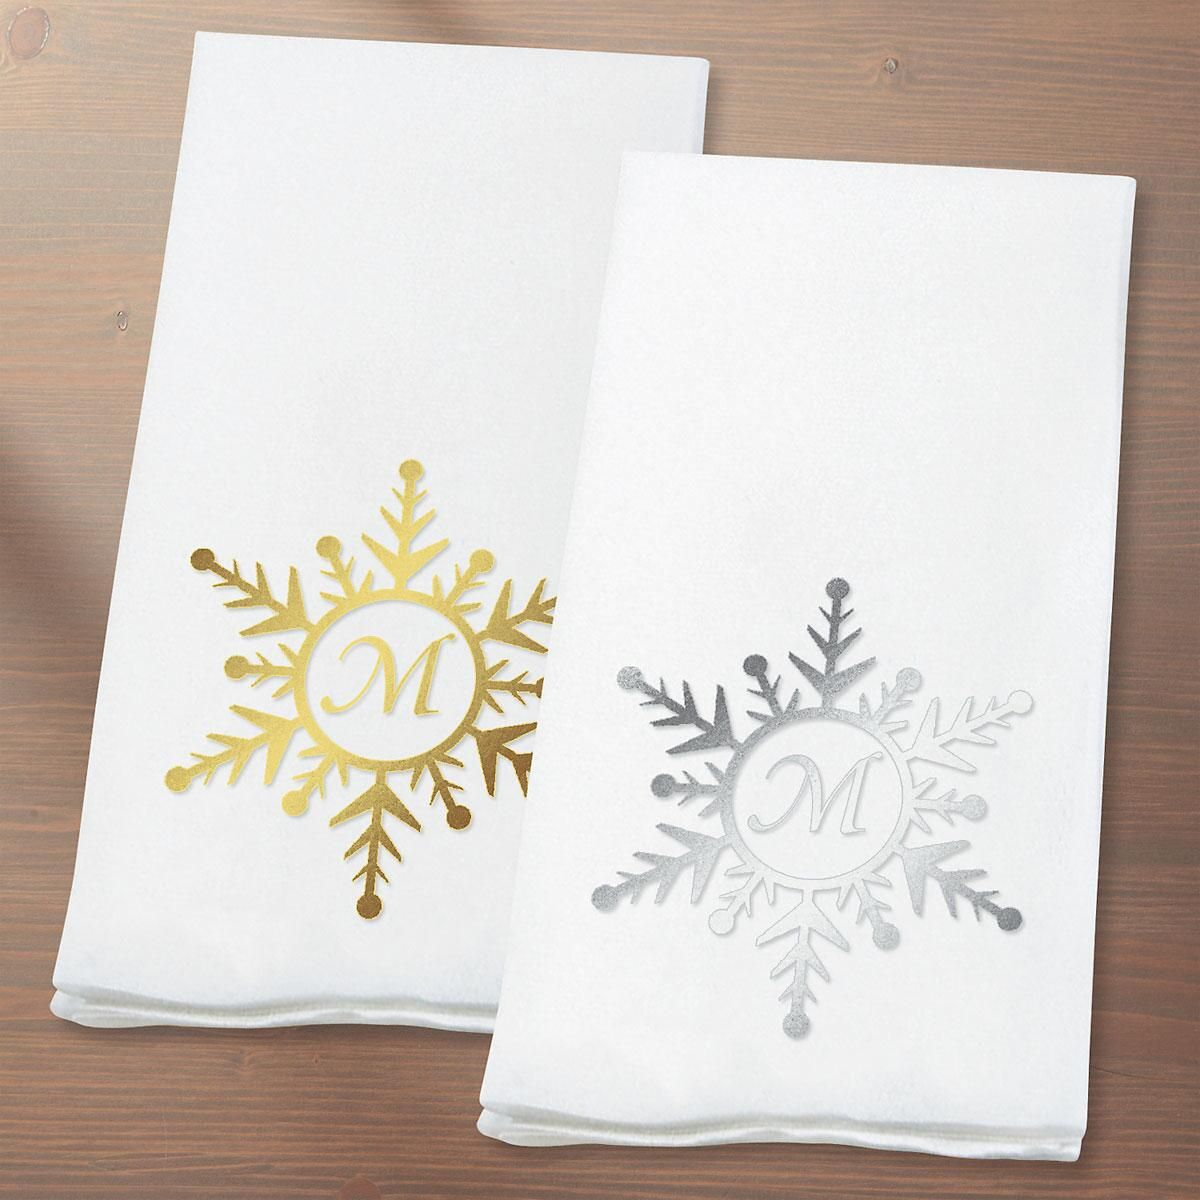 Monogrammed Guest Towels